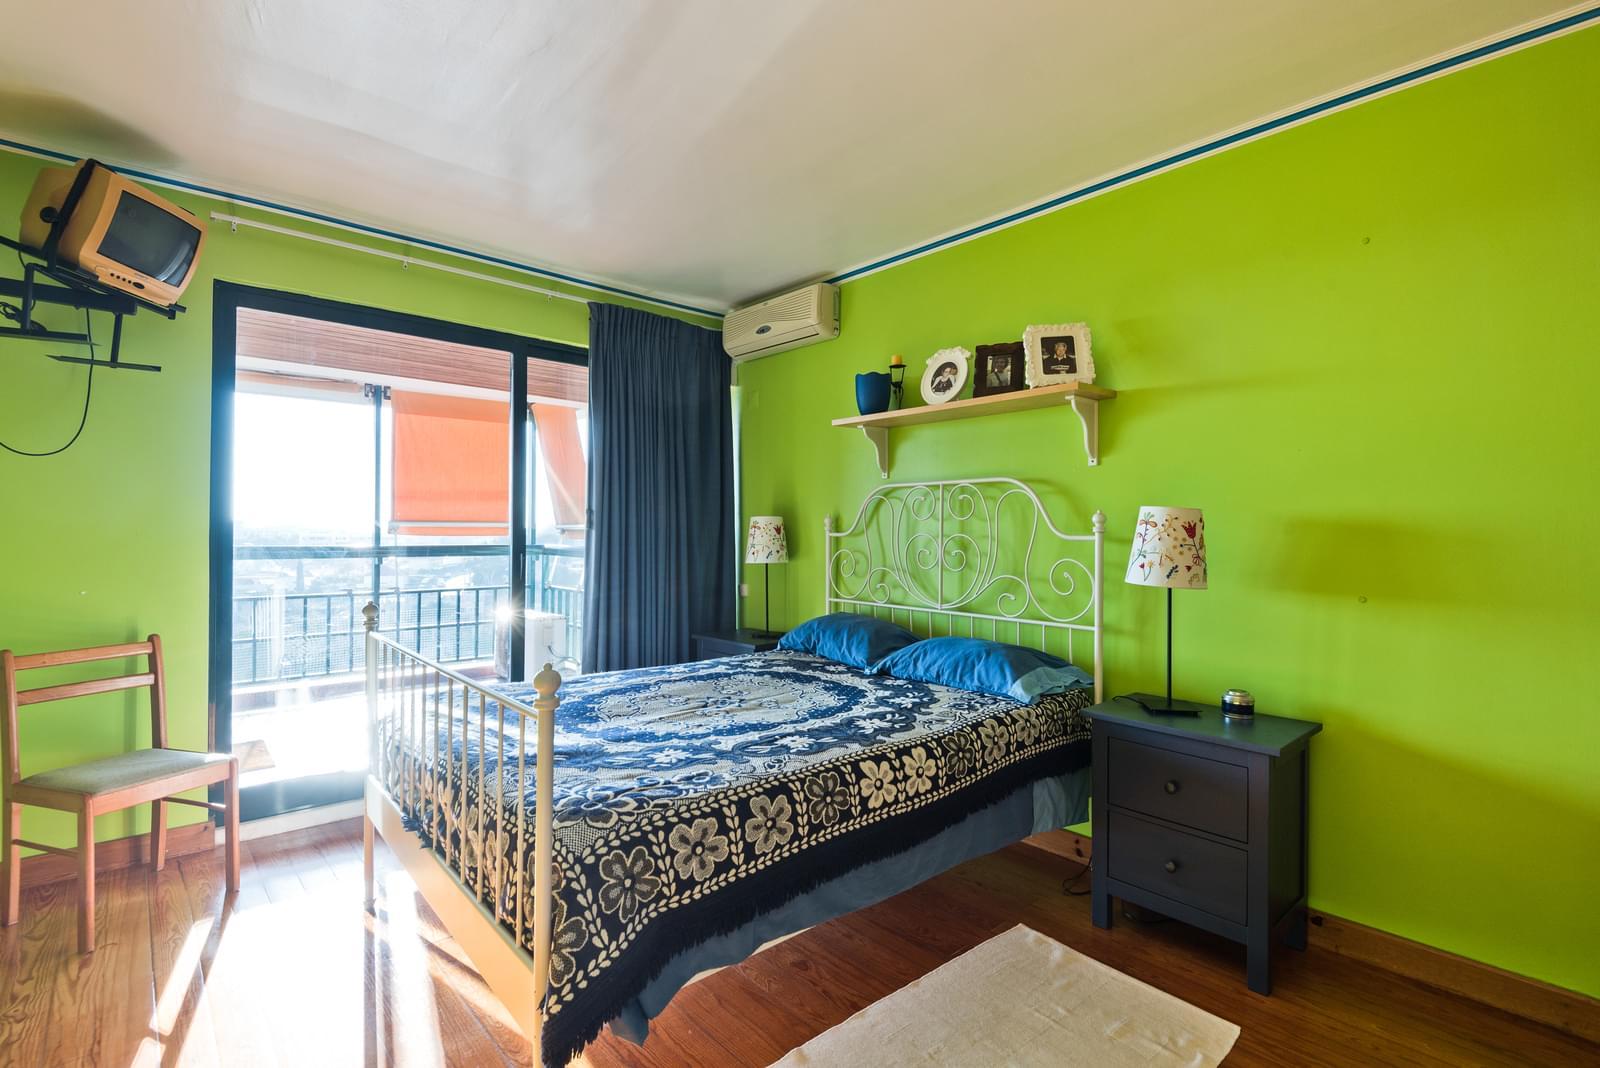 pf19112-apartamento-t3-cascais-85d0c363-1cb8-4e7f-9ba1-b5f525e770db